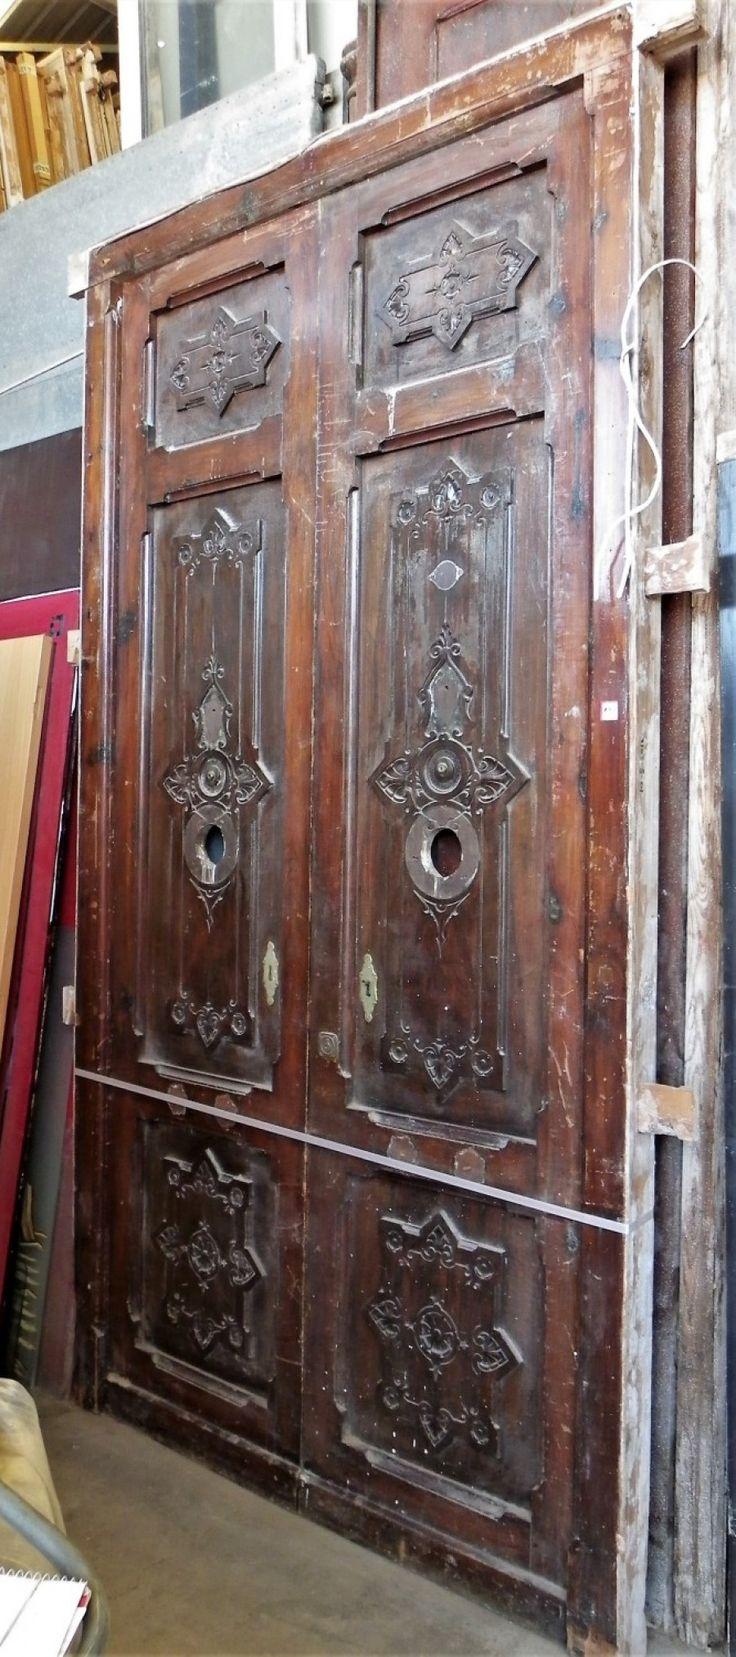 Las 25 mejores ideas sobre puerta de entrada en pinterest for Puerta xor de tres entradas